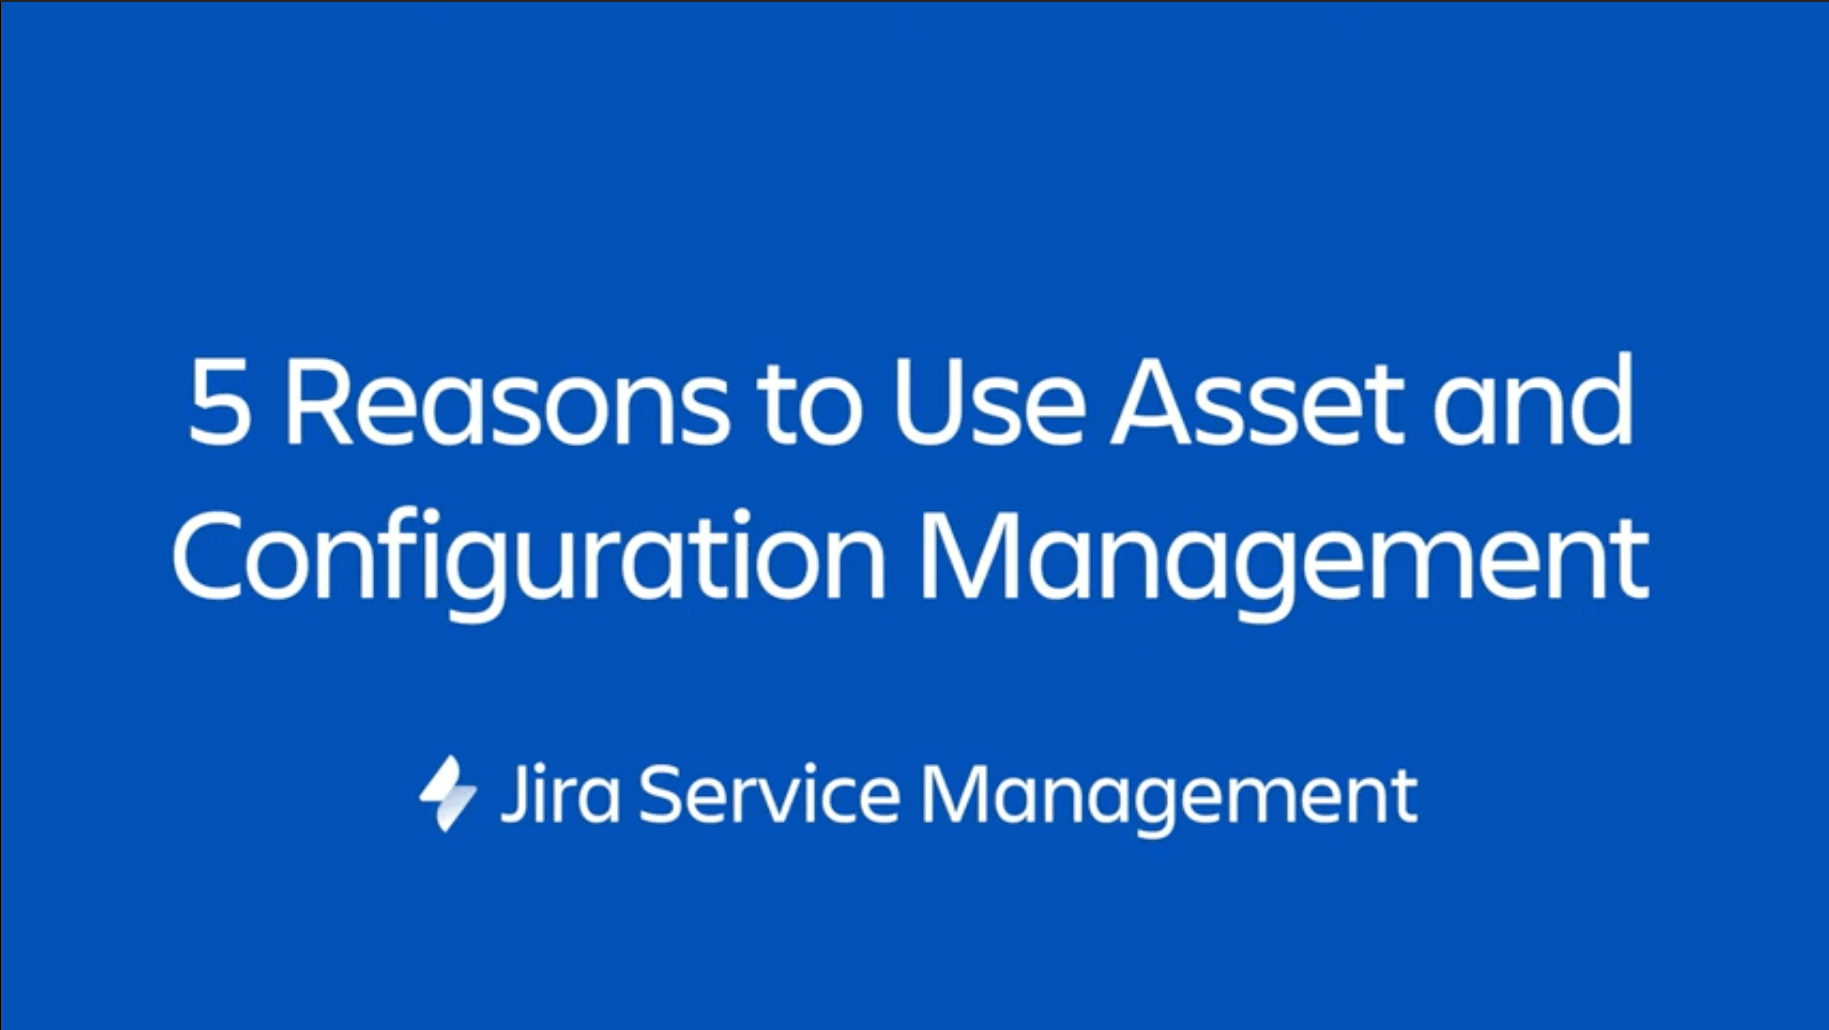 Jira Service Management で、Jira Software の可能性をさらに高める